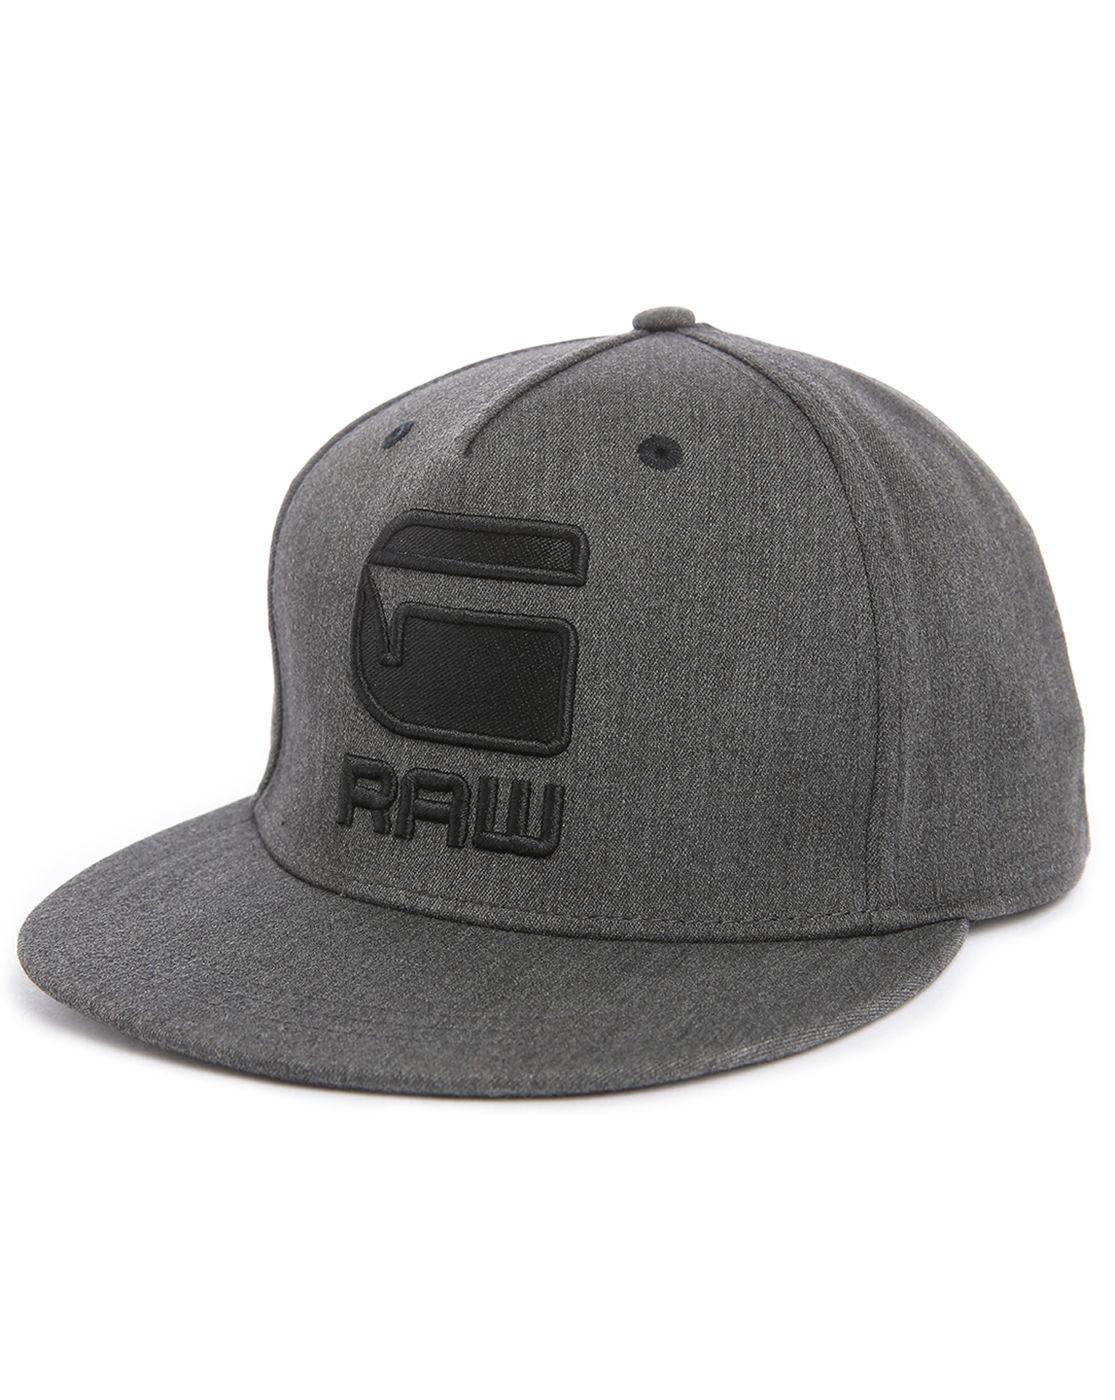 G Star Raw Grey Originals Logo Coper Cap In Gray For Men